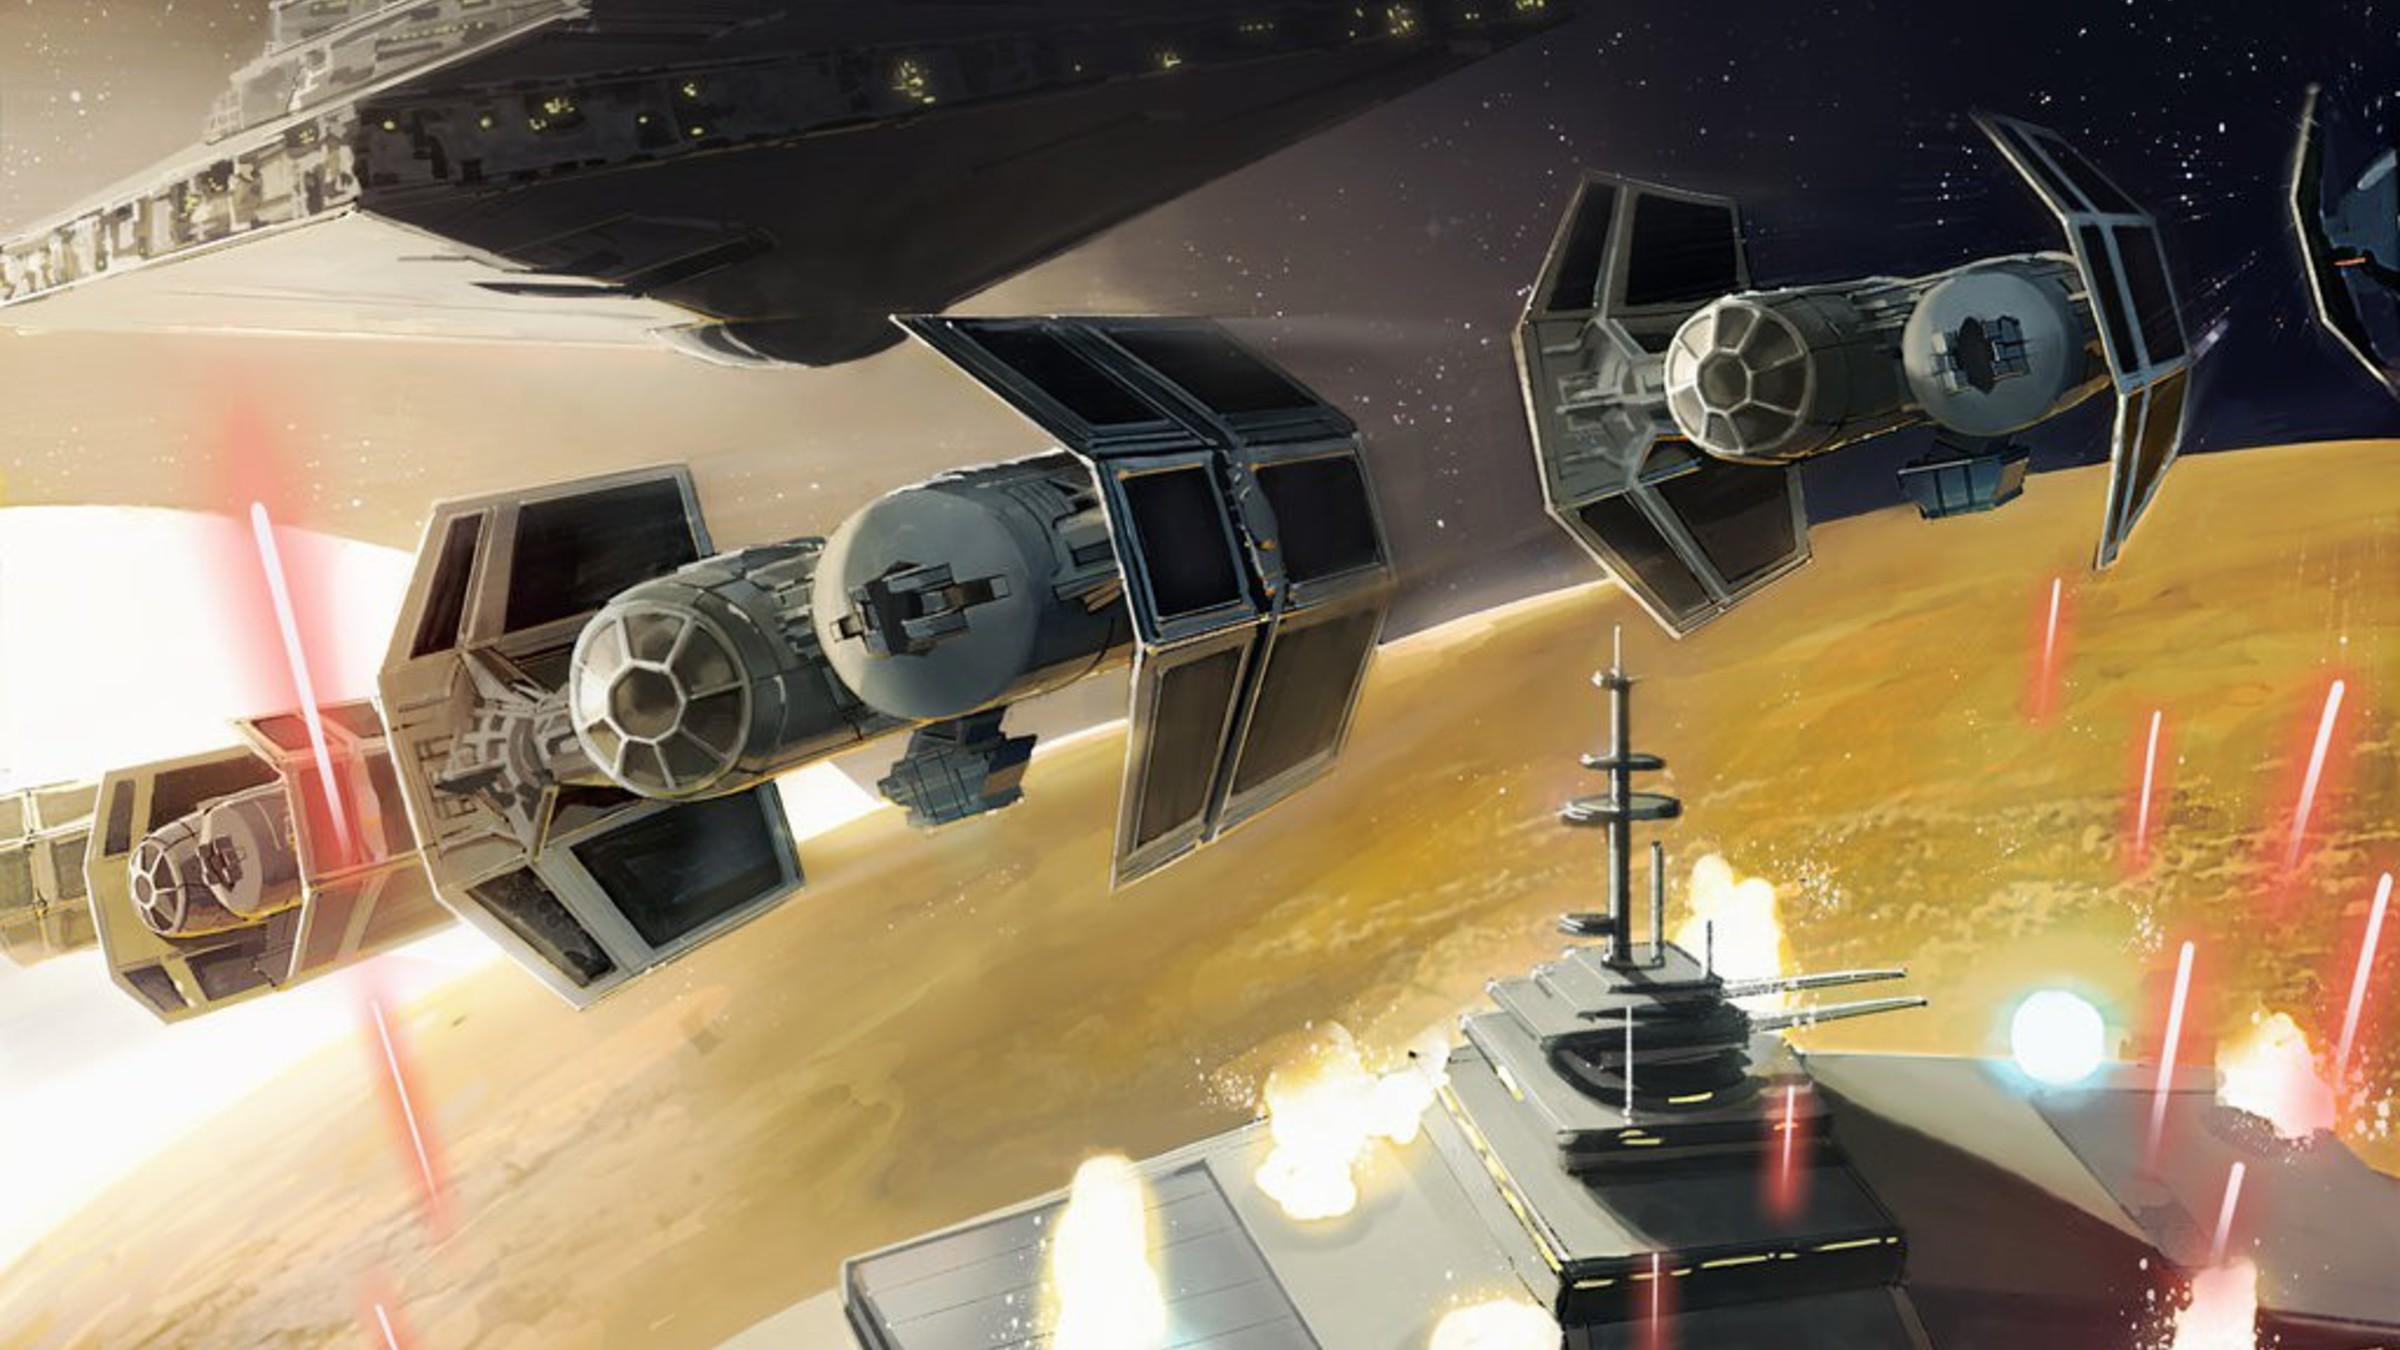 Star wars destroyers tie bomber artwork futuristic wallpaper ...